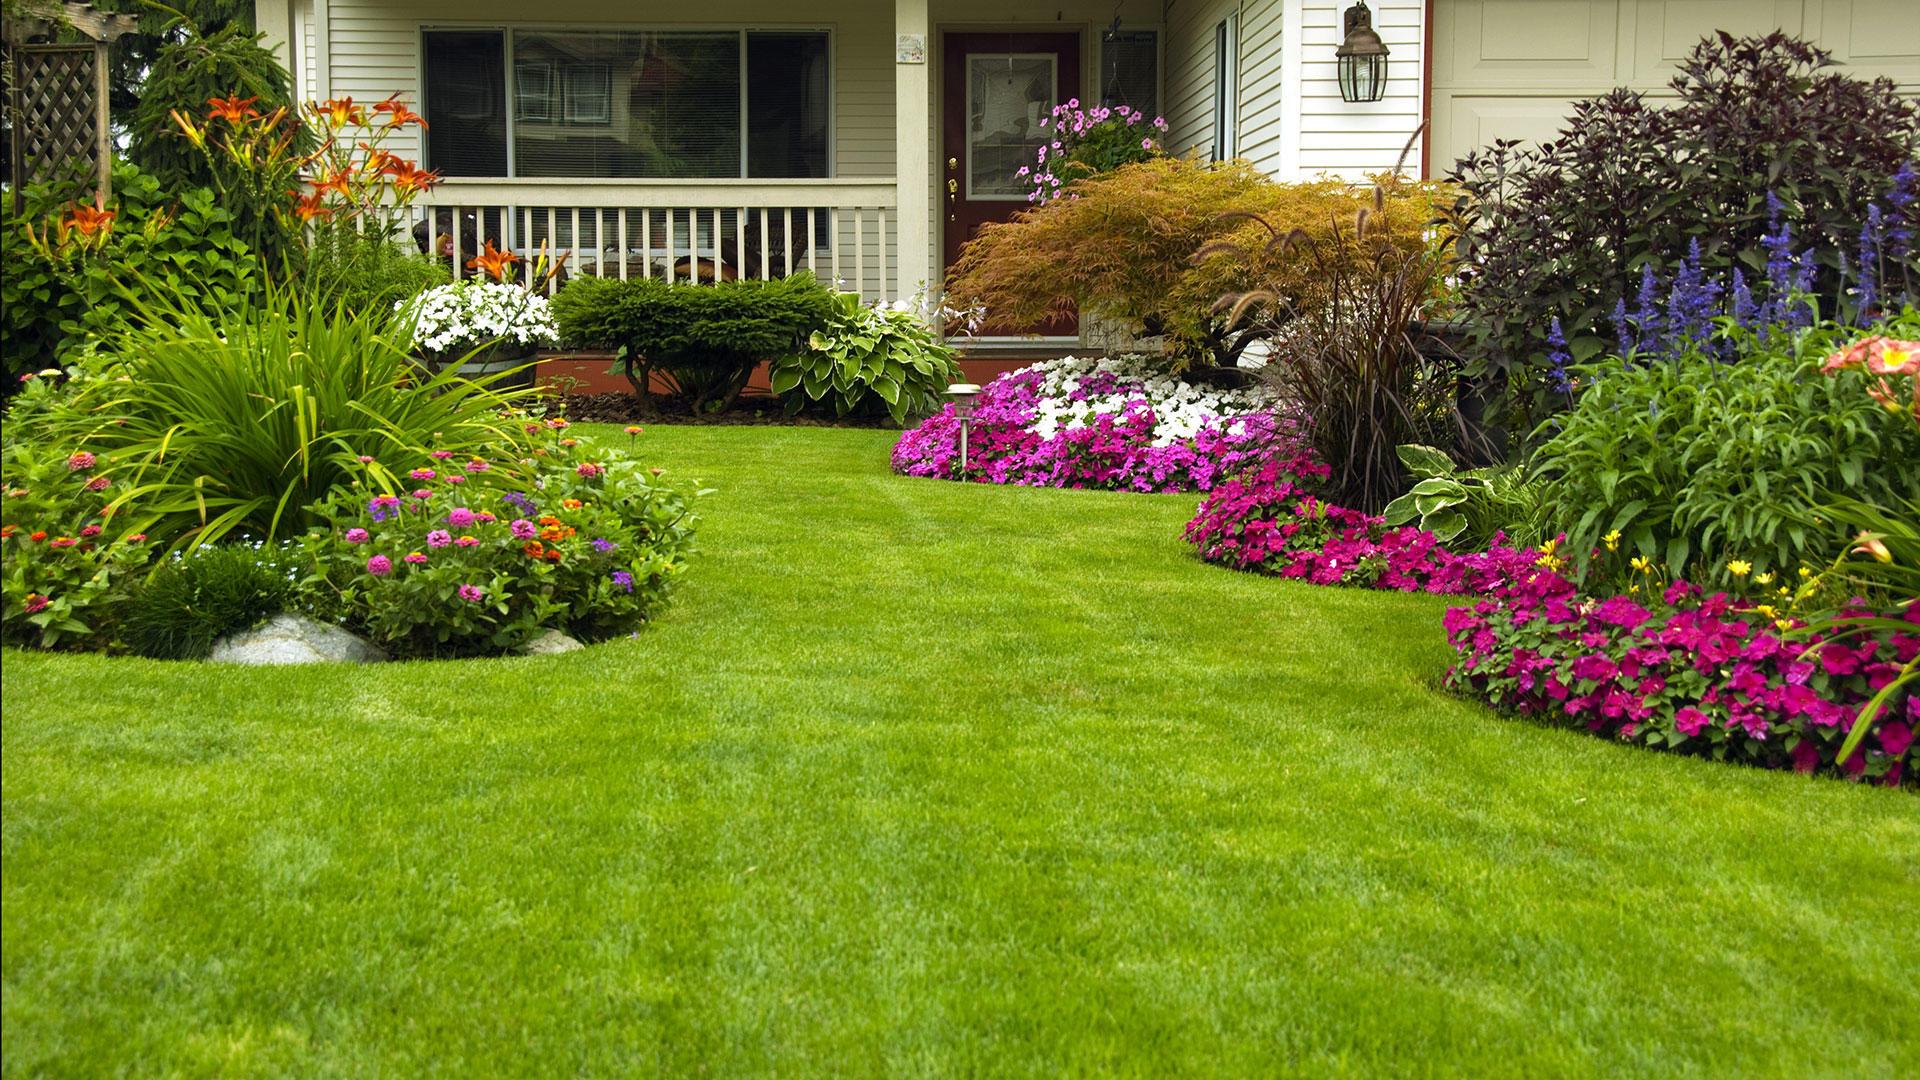 Blue Ridge Mtn Property Services, LLC image 1